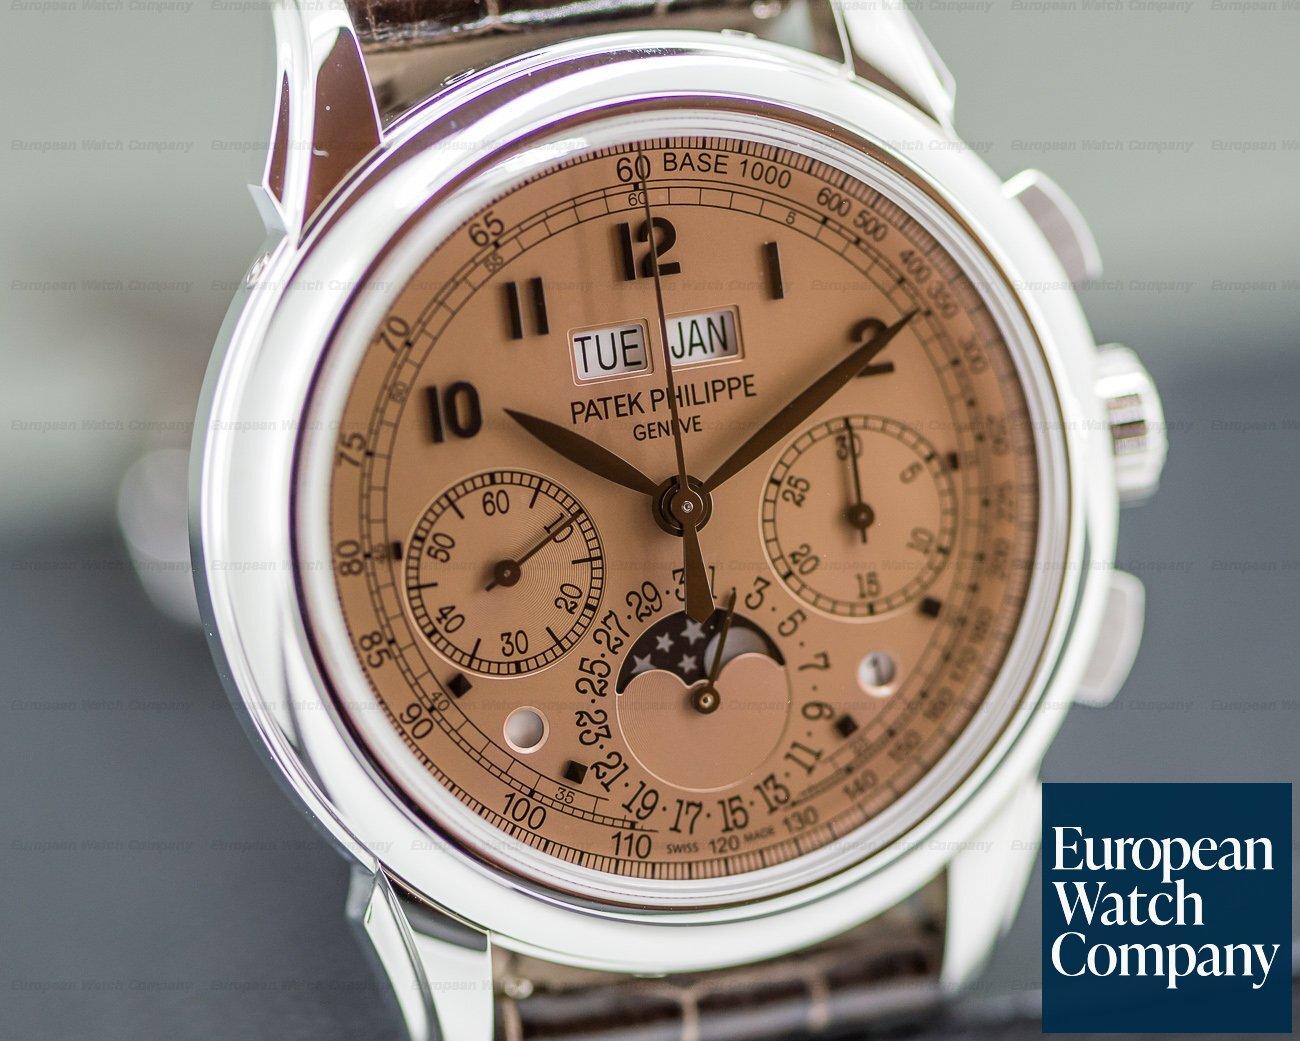 Patek Philippe 5270P-001 5270P Perpetual Calendar Chronograph Platinum Salmon Dial UNWORN